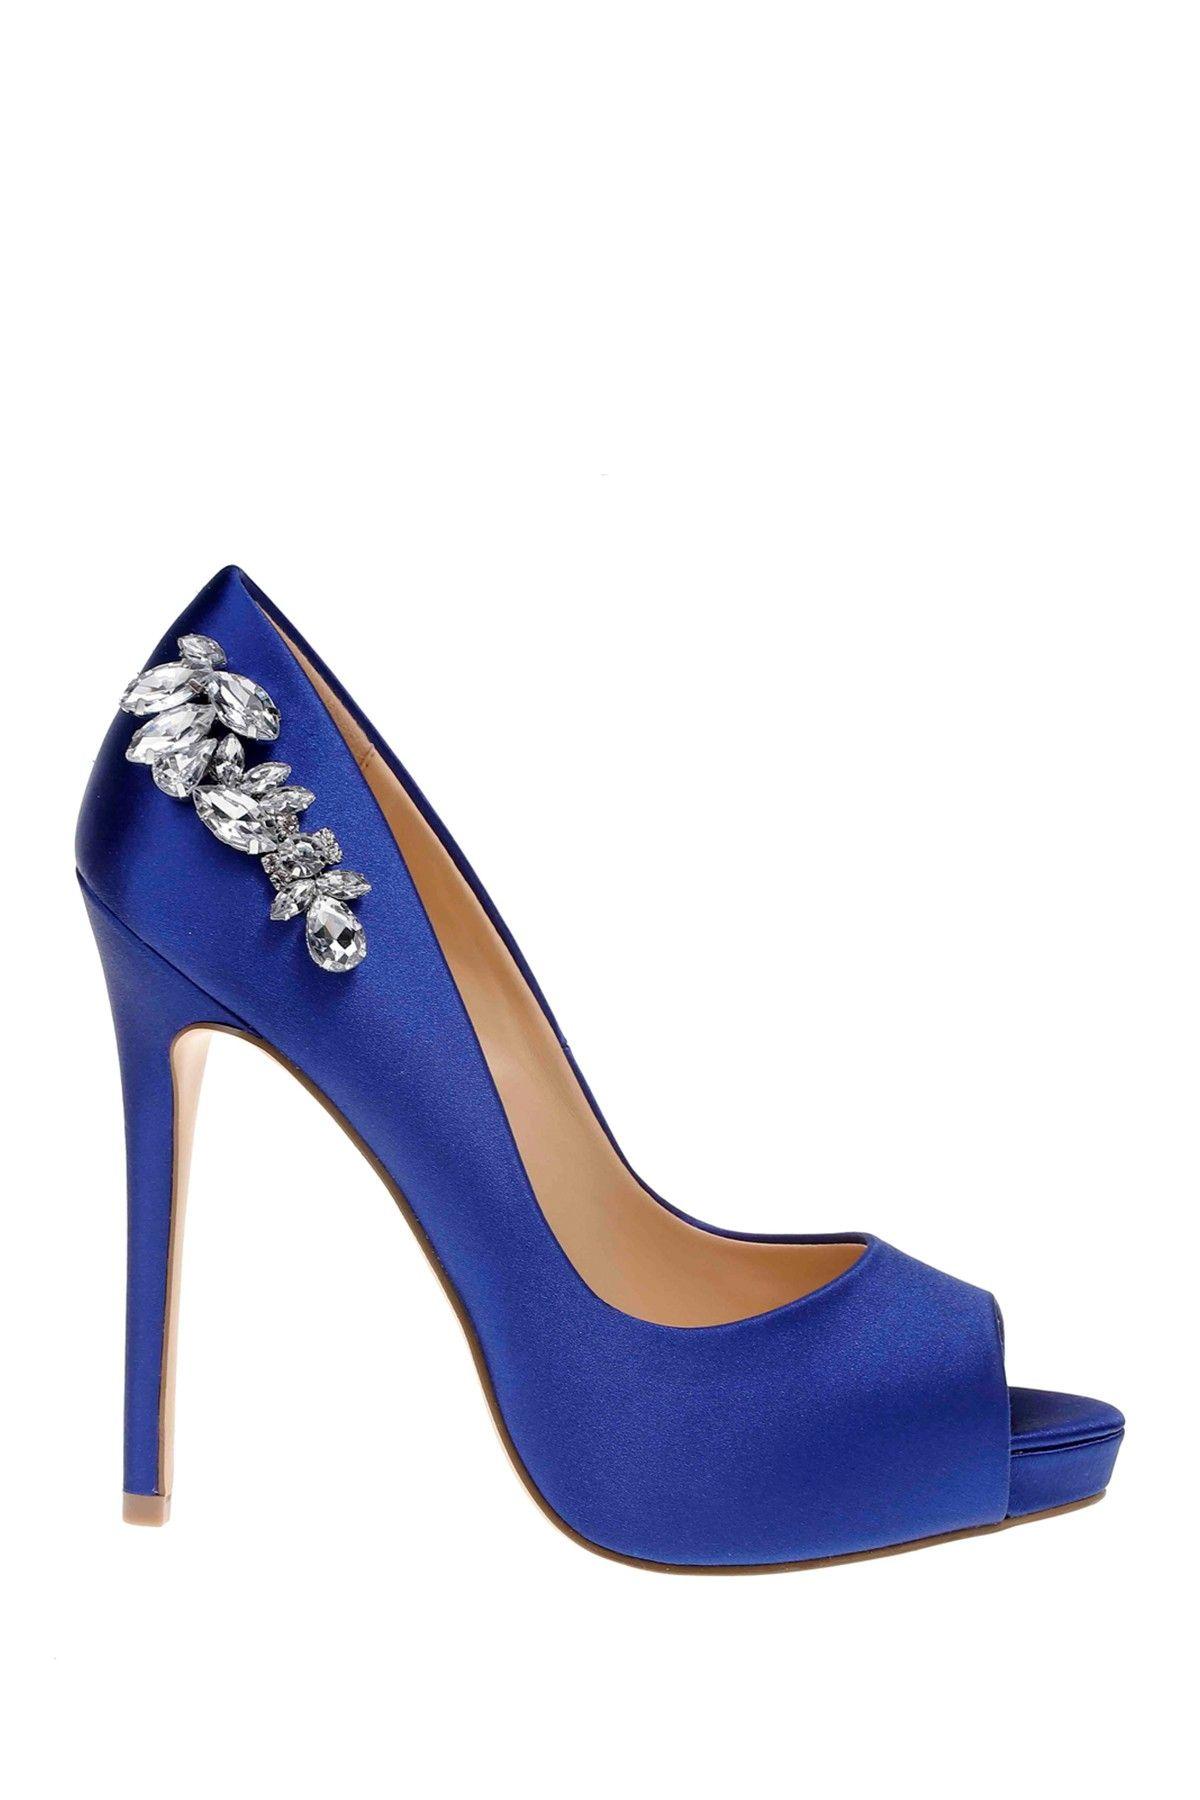 269d9e15395 Elizabeth Platform Stiletto Heel by American Glamour by Badgley Mischka on   HauteLook